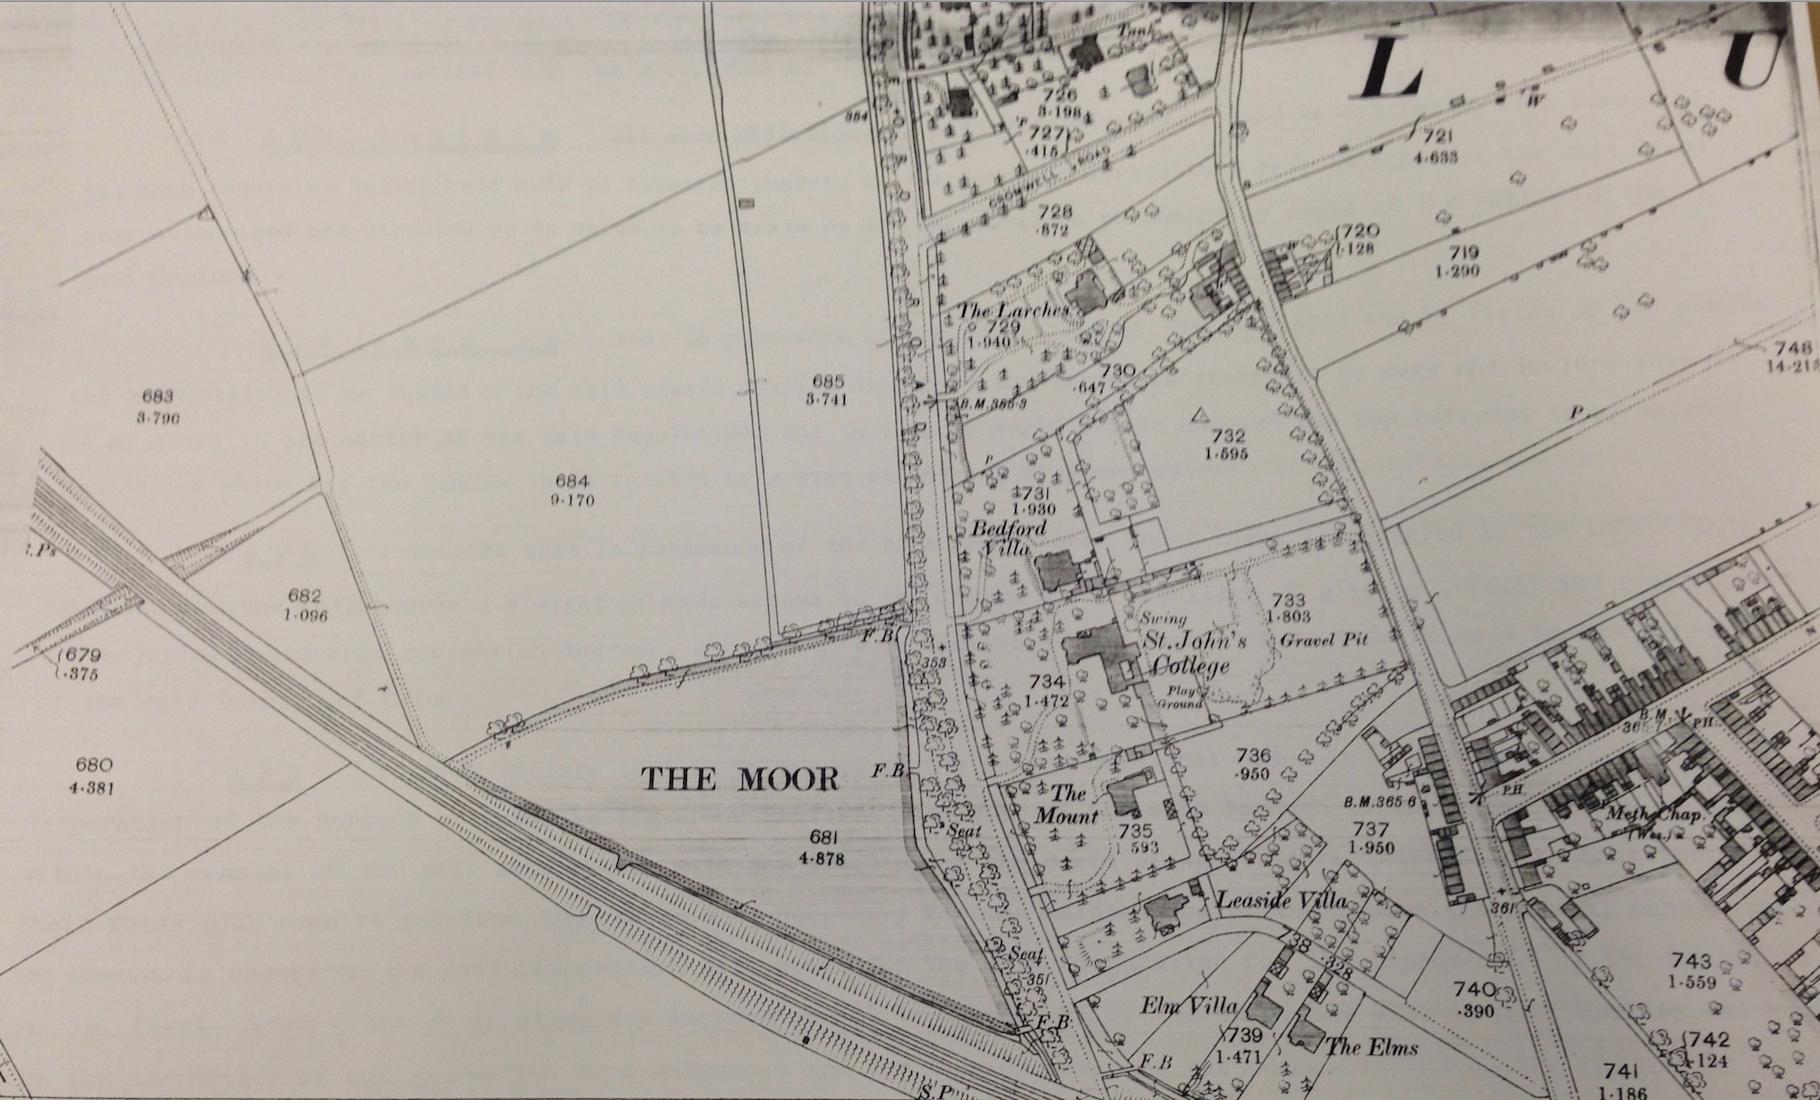 The Moor, Luton 1880